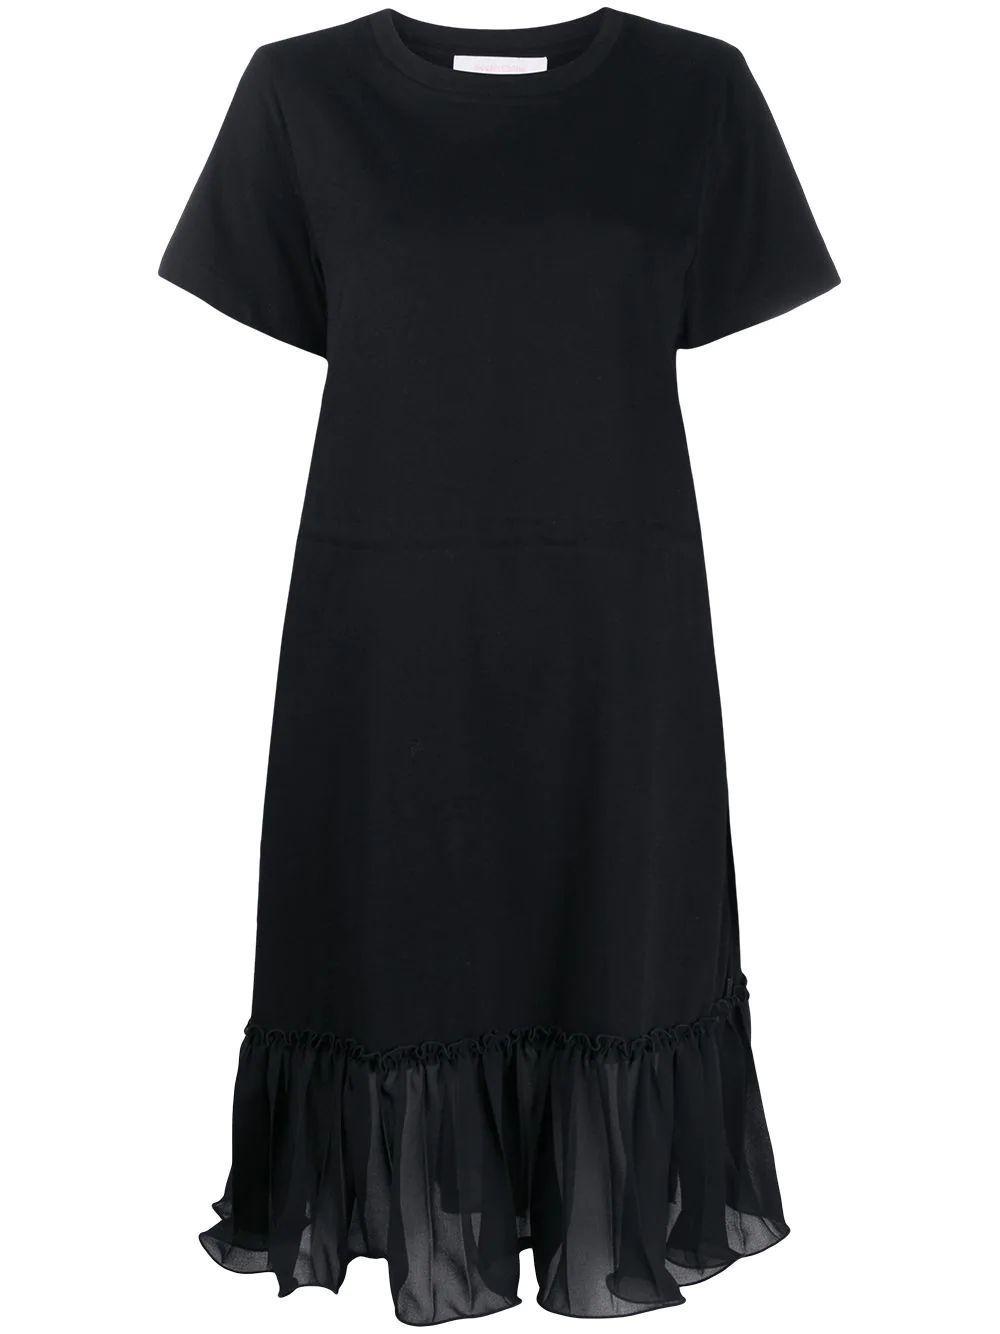 Ruffle Detail Drawstring T- Shirt Dress Item # CHS20AJR30082